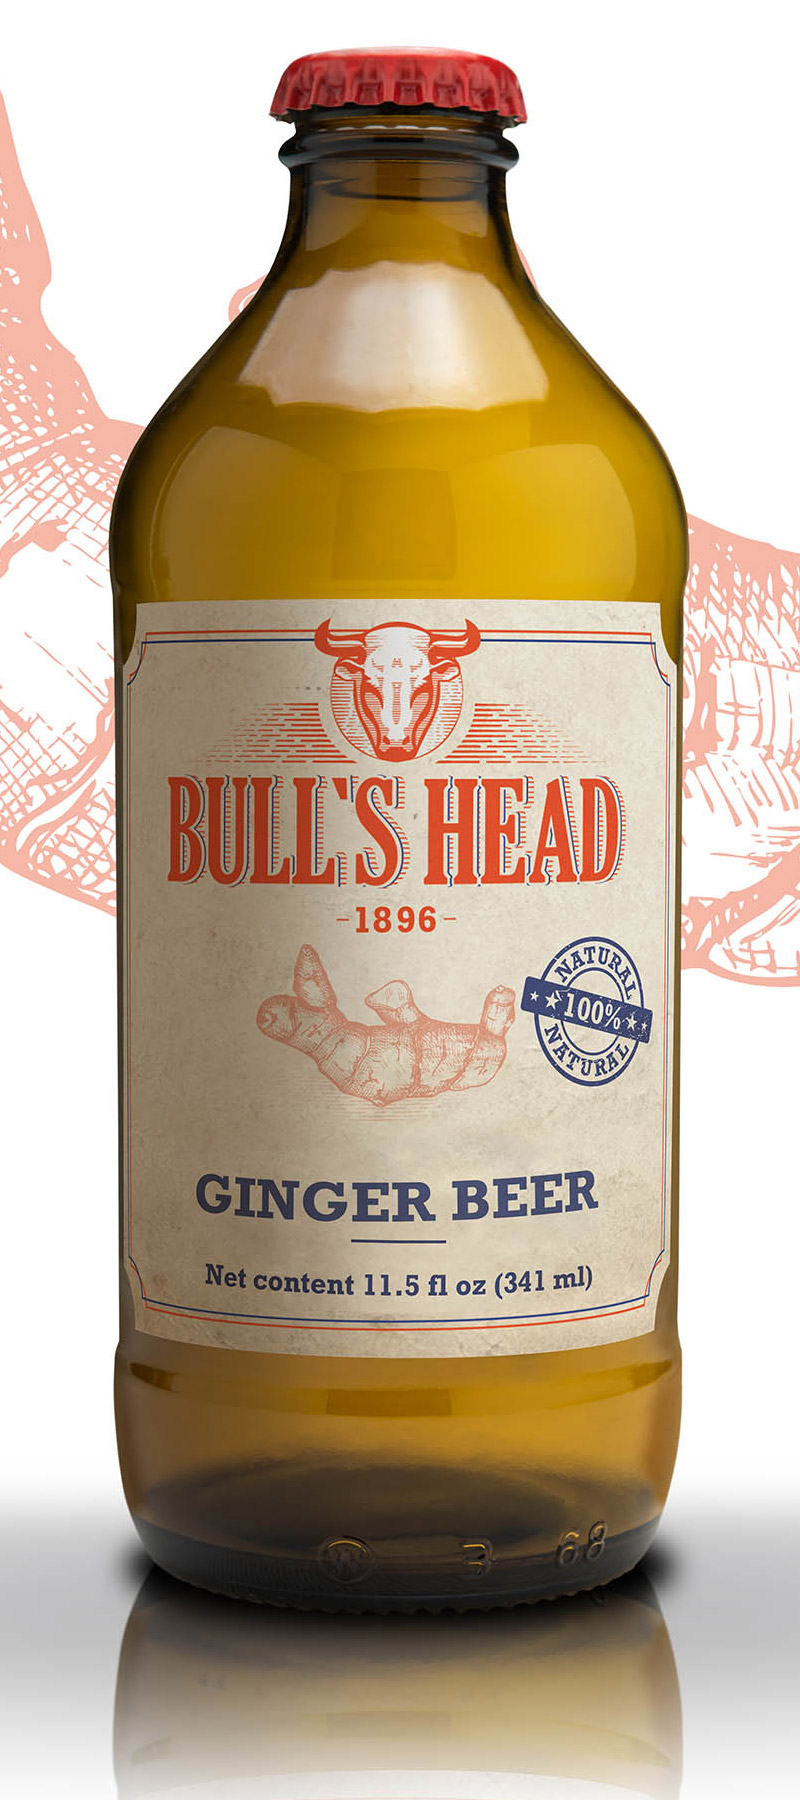 Bière de Gingembre 341 mL*_*Ginger Beer 341 mL*_*Cerveza de Jengibre 341 mL